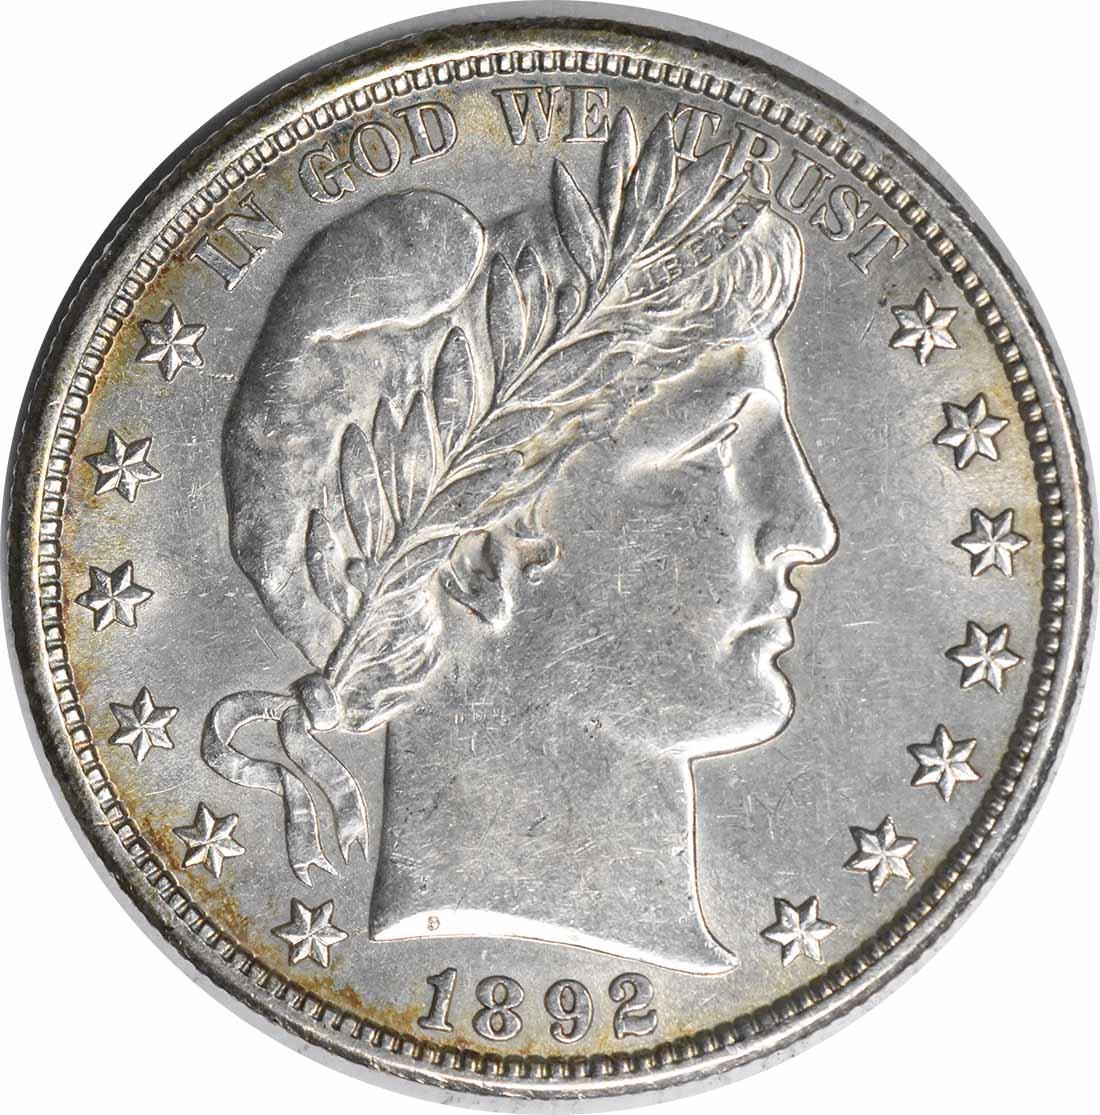 1892 Barber Silver Half Dollar AU58 Uncertified #1214